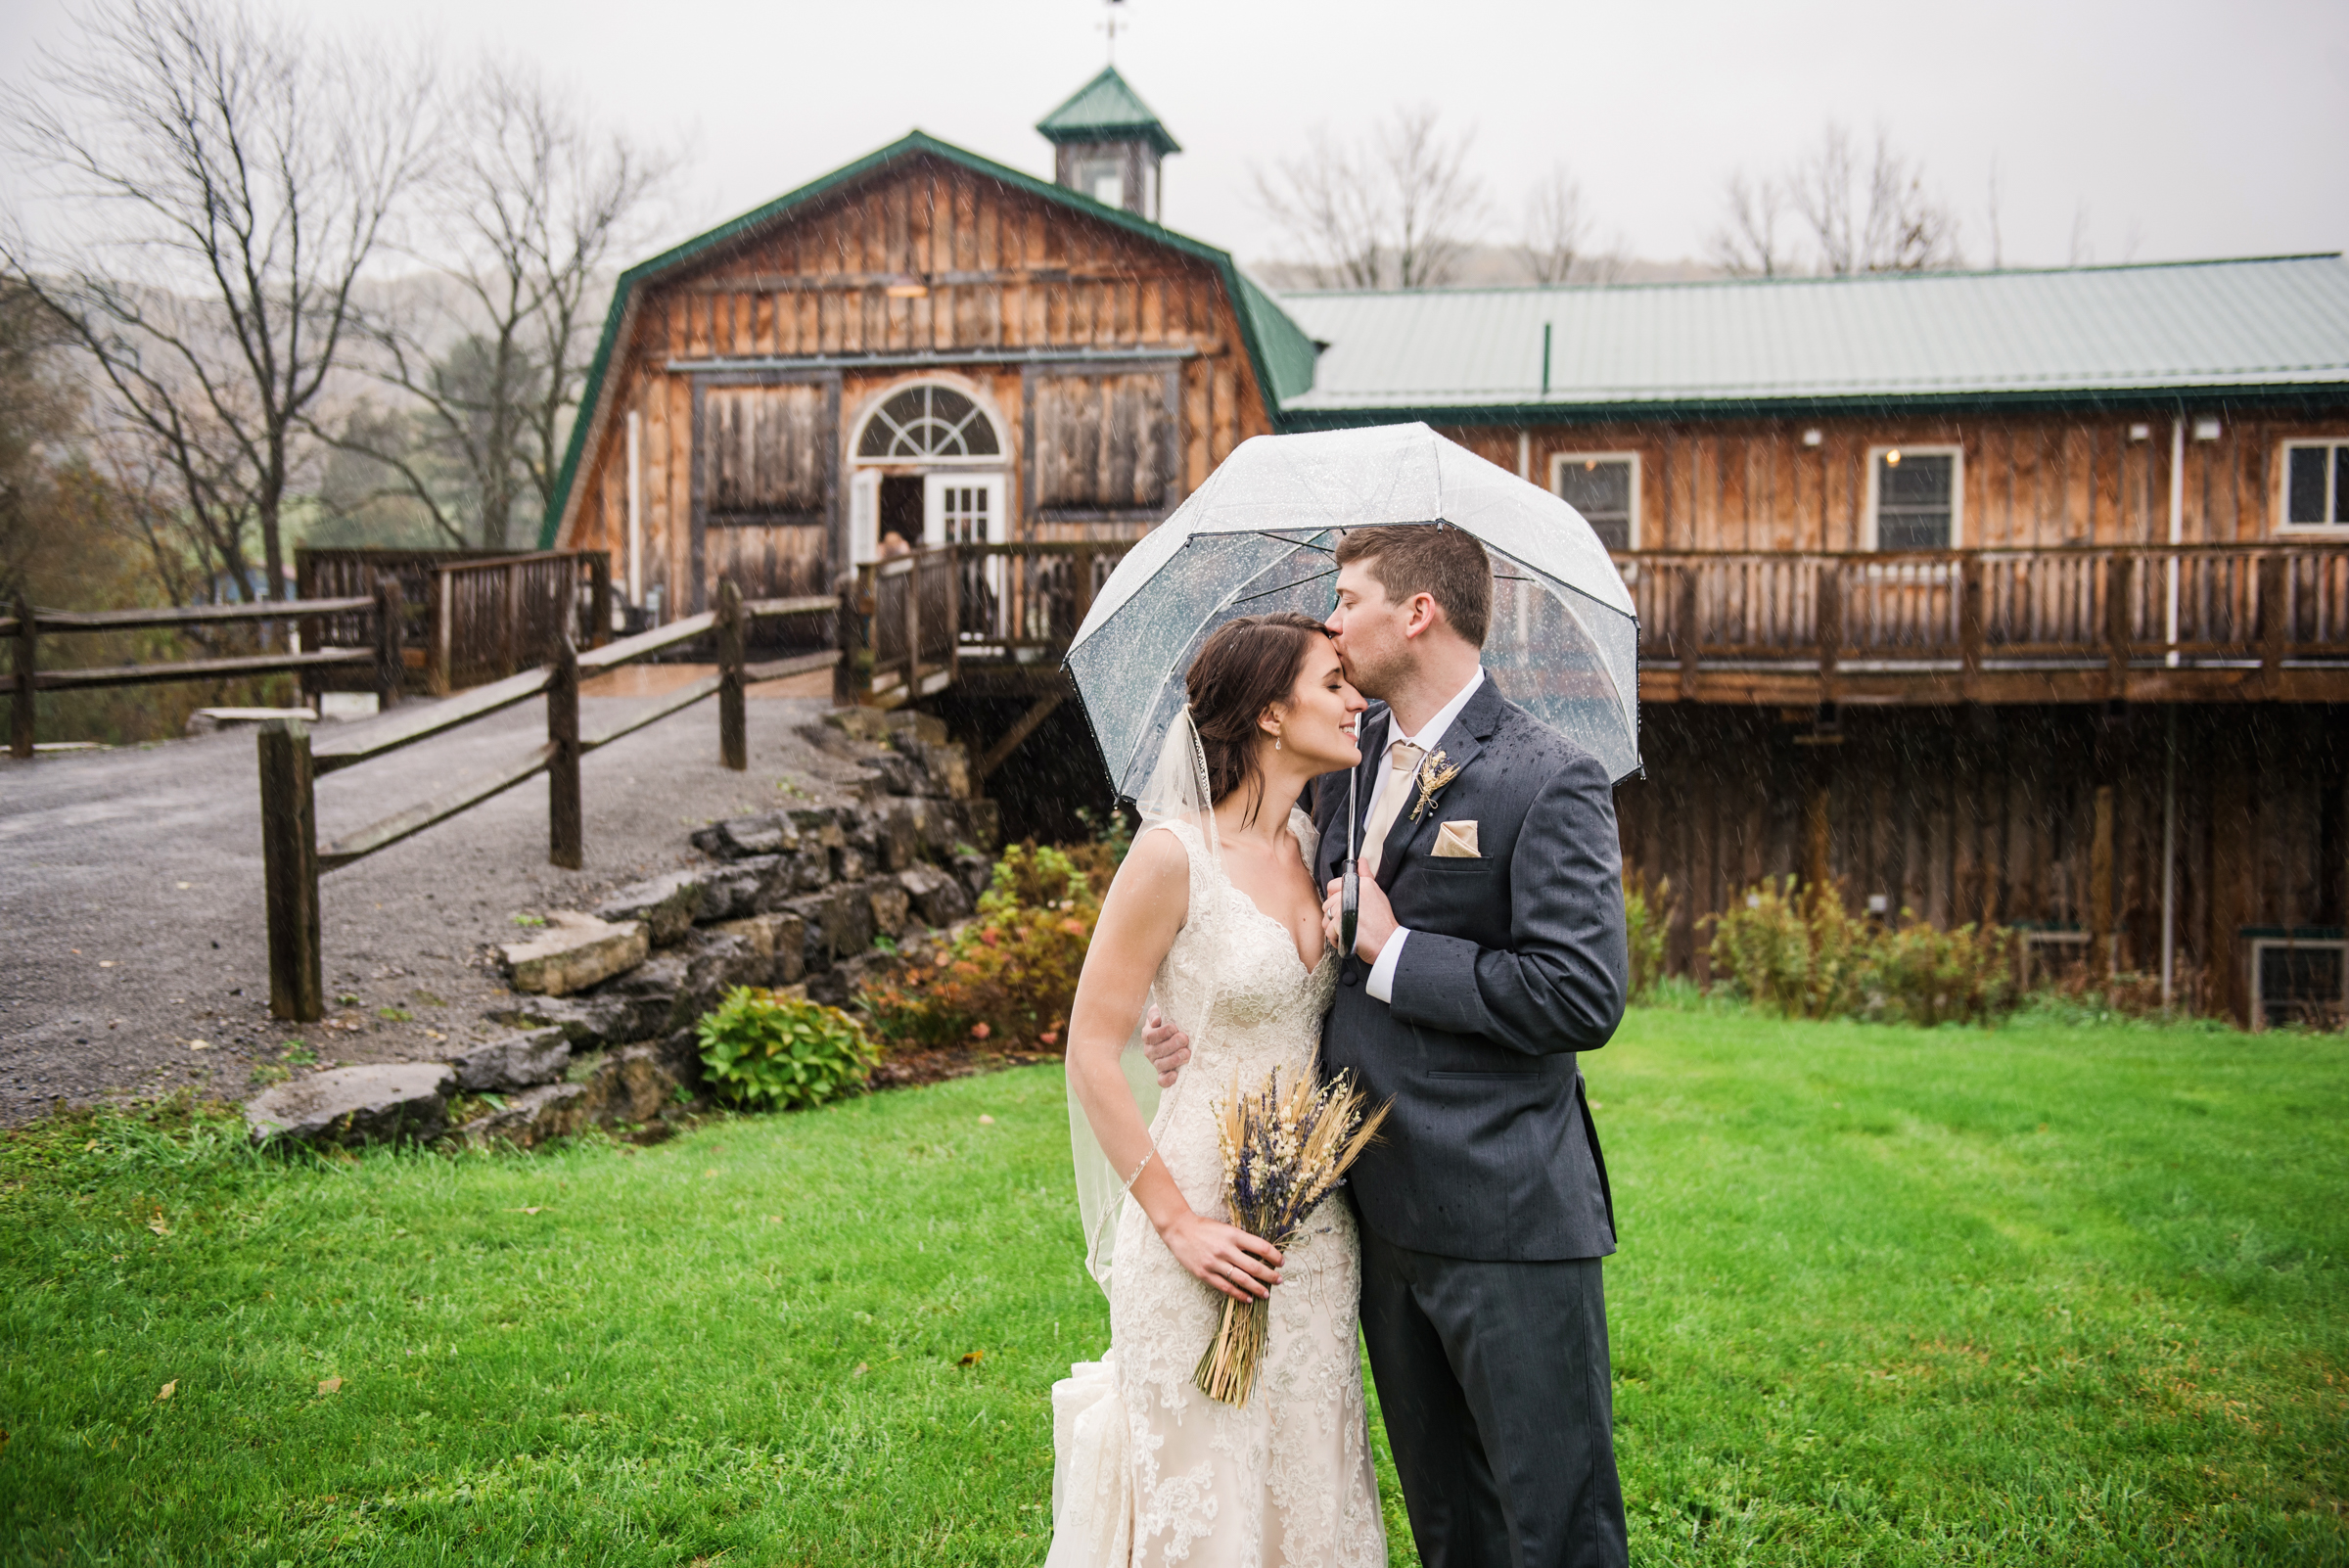 Wolf_Oak_Acres_Central_NY_Wedding_JILL_STUDIO_Rochester_NY_Photographer_DSC_7548.jpg